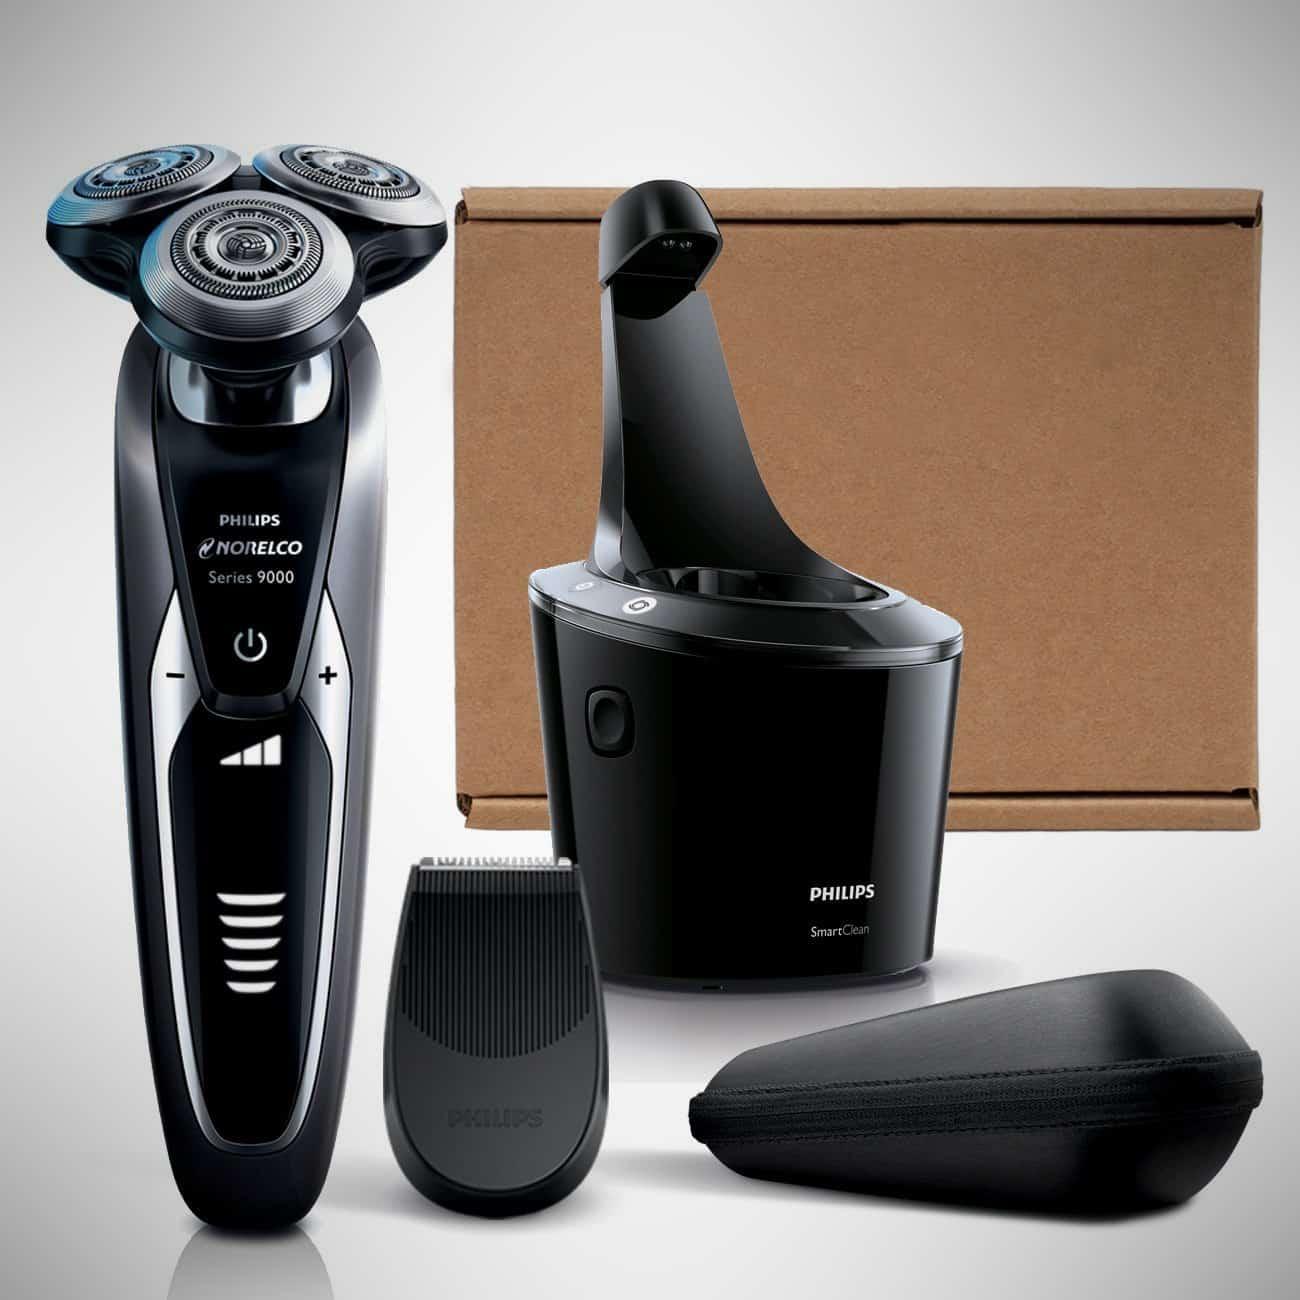 PhilipsNorelco Shaver 9300 – electric razor